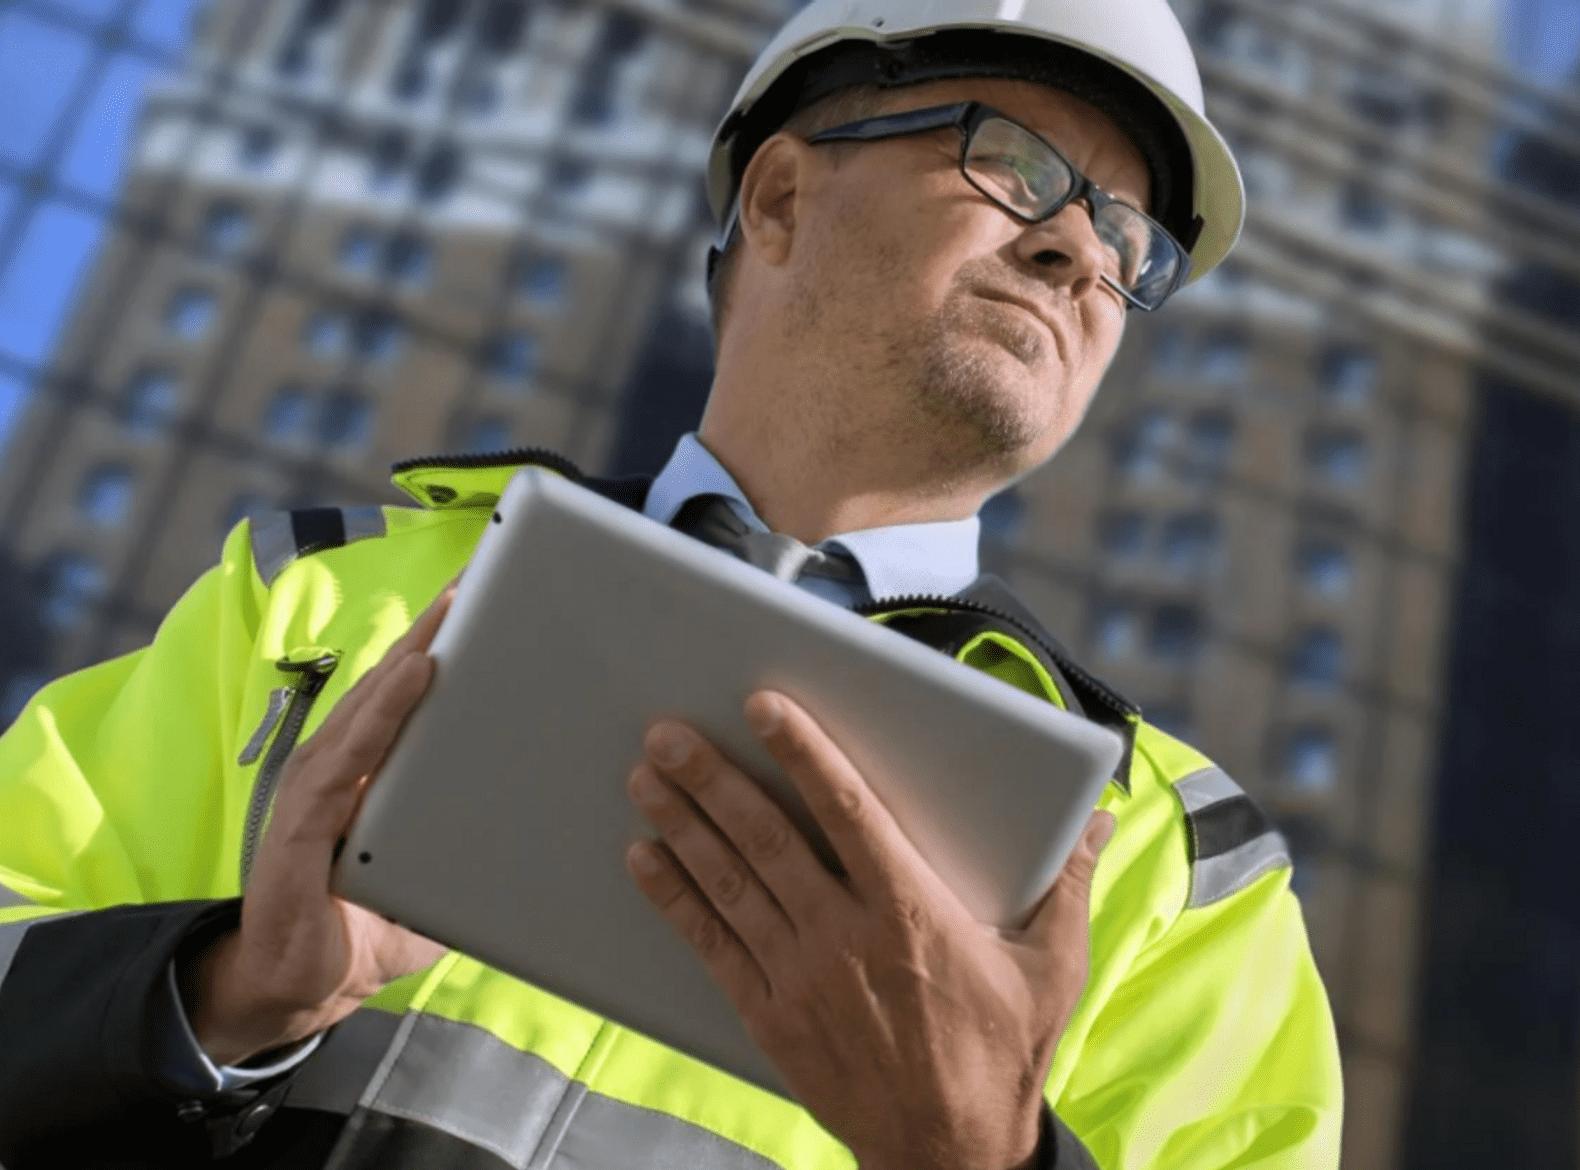 Accruent - Resources - Webinars - Building Operational Readiness - Hero